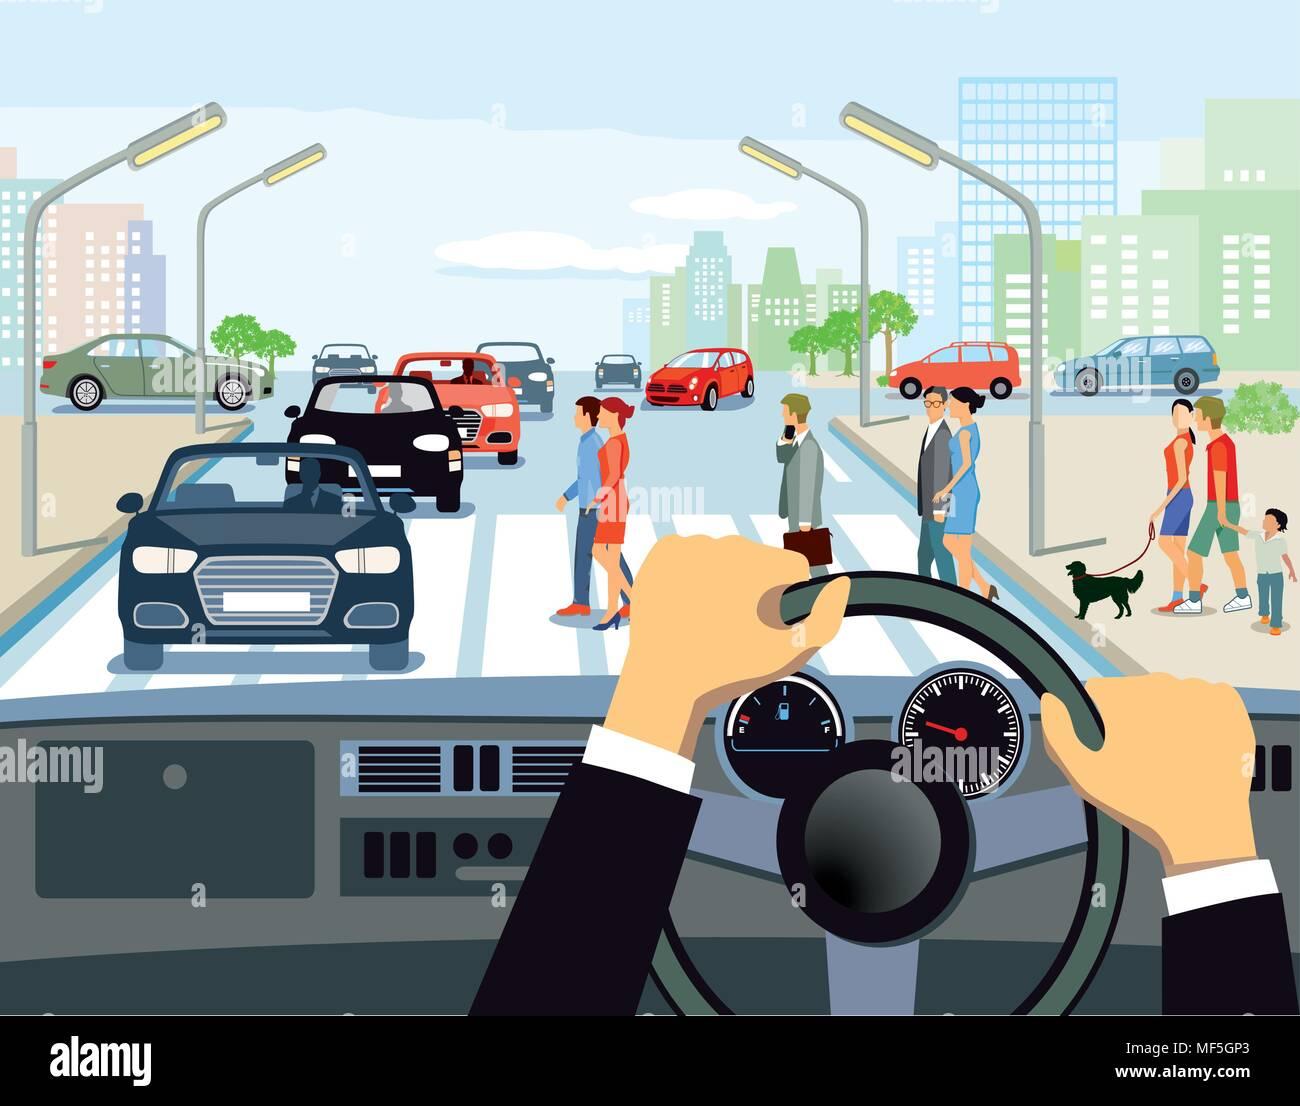 Pedestrian Crossing Stock Vector Images